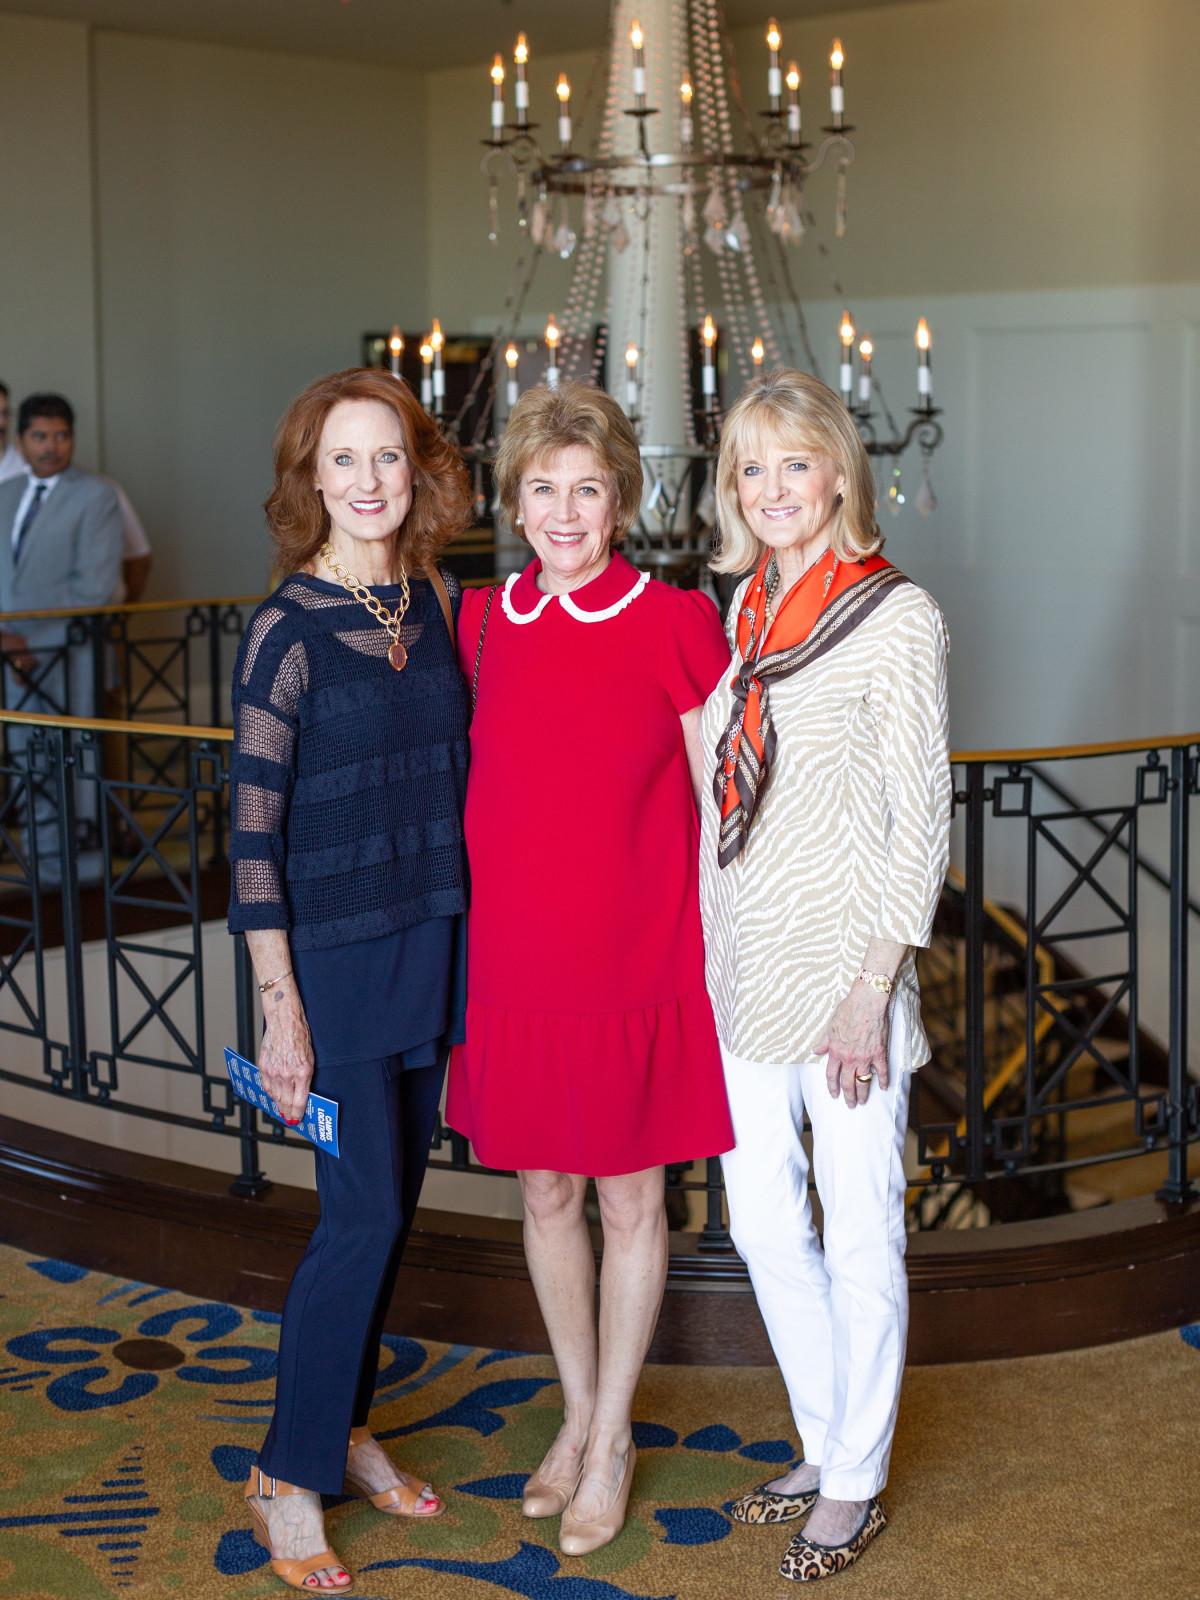 Kathy Amparan, Cheryl Conatser, Carol Severson